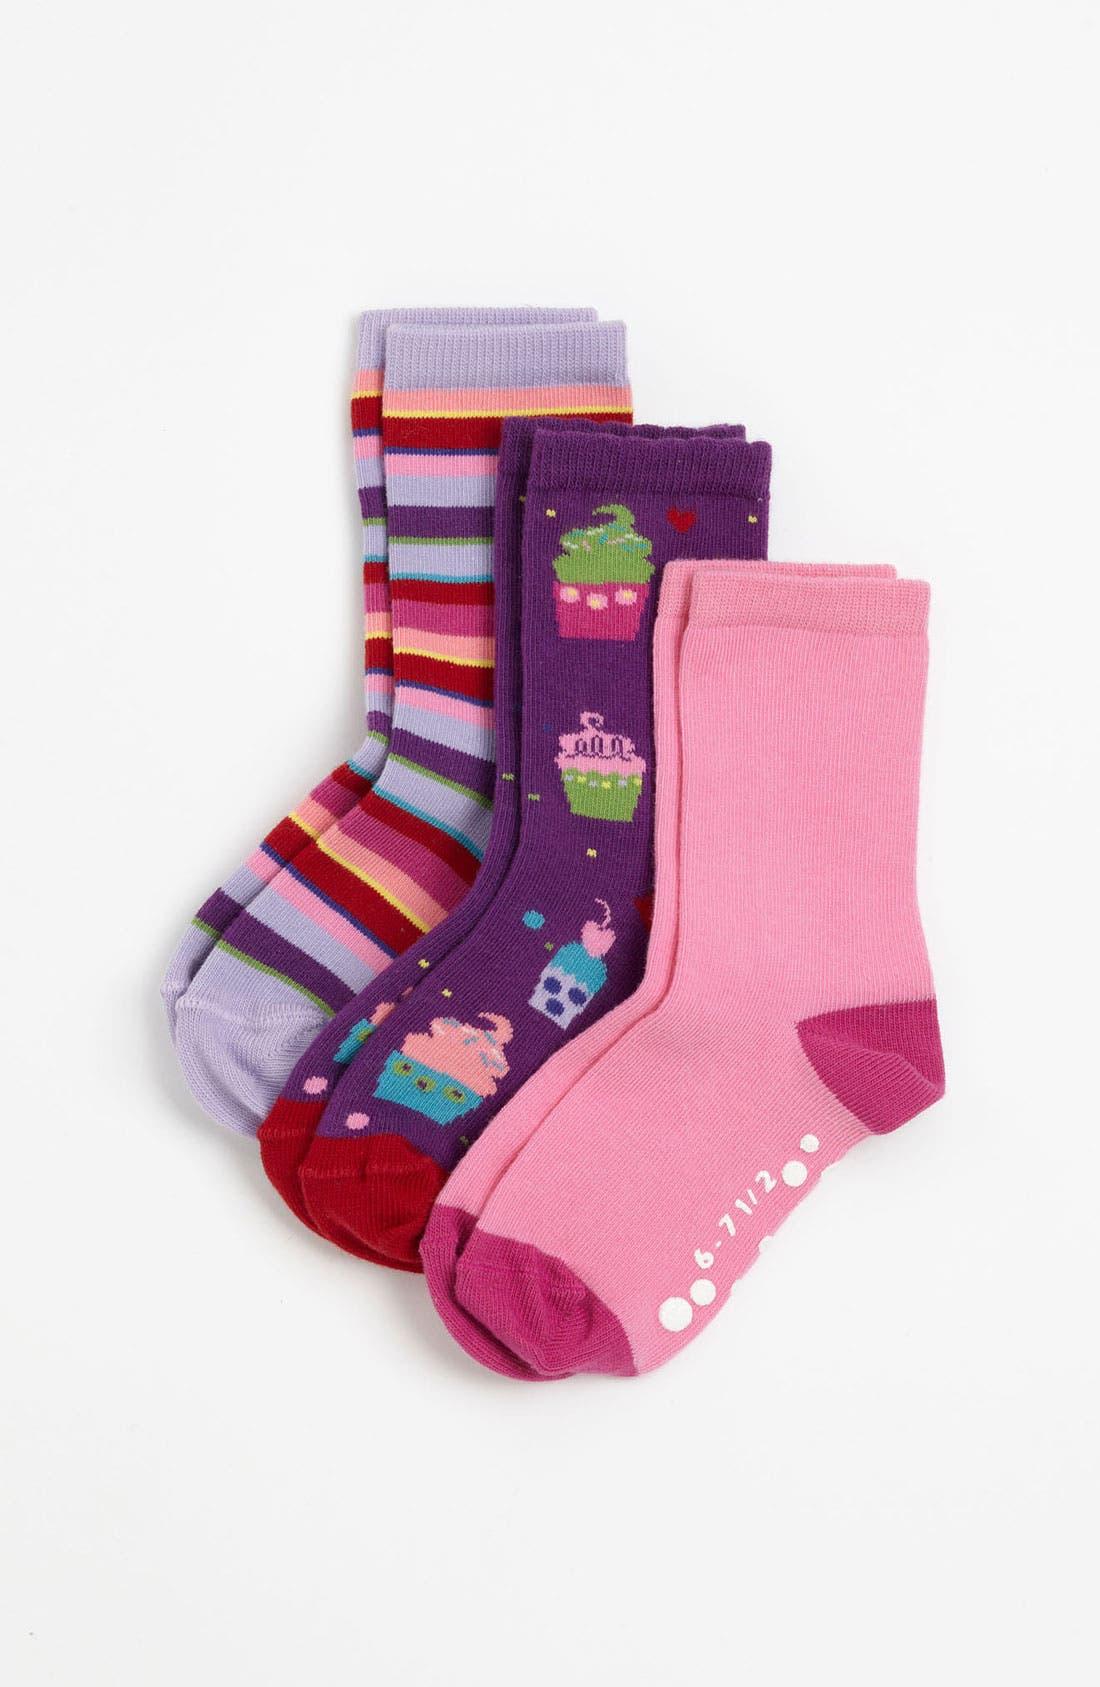 Alternate Image 1 Selected - Nordstrom 'Sweet Treats' Crew Socks (3-Pack) (Girls)